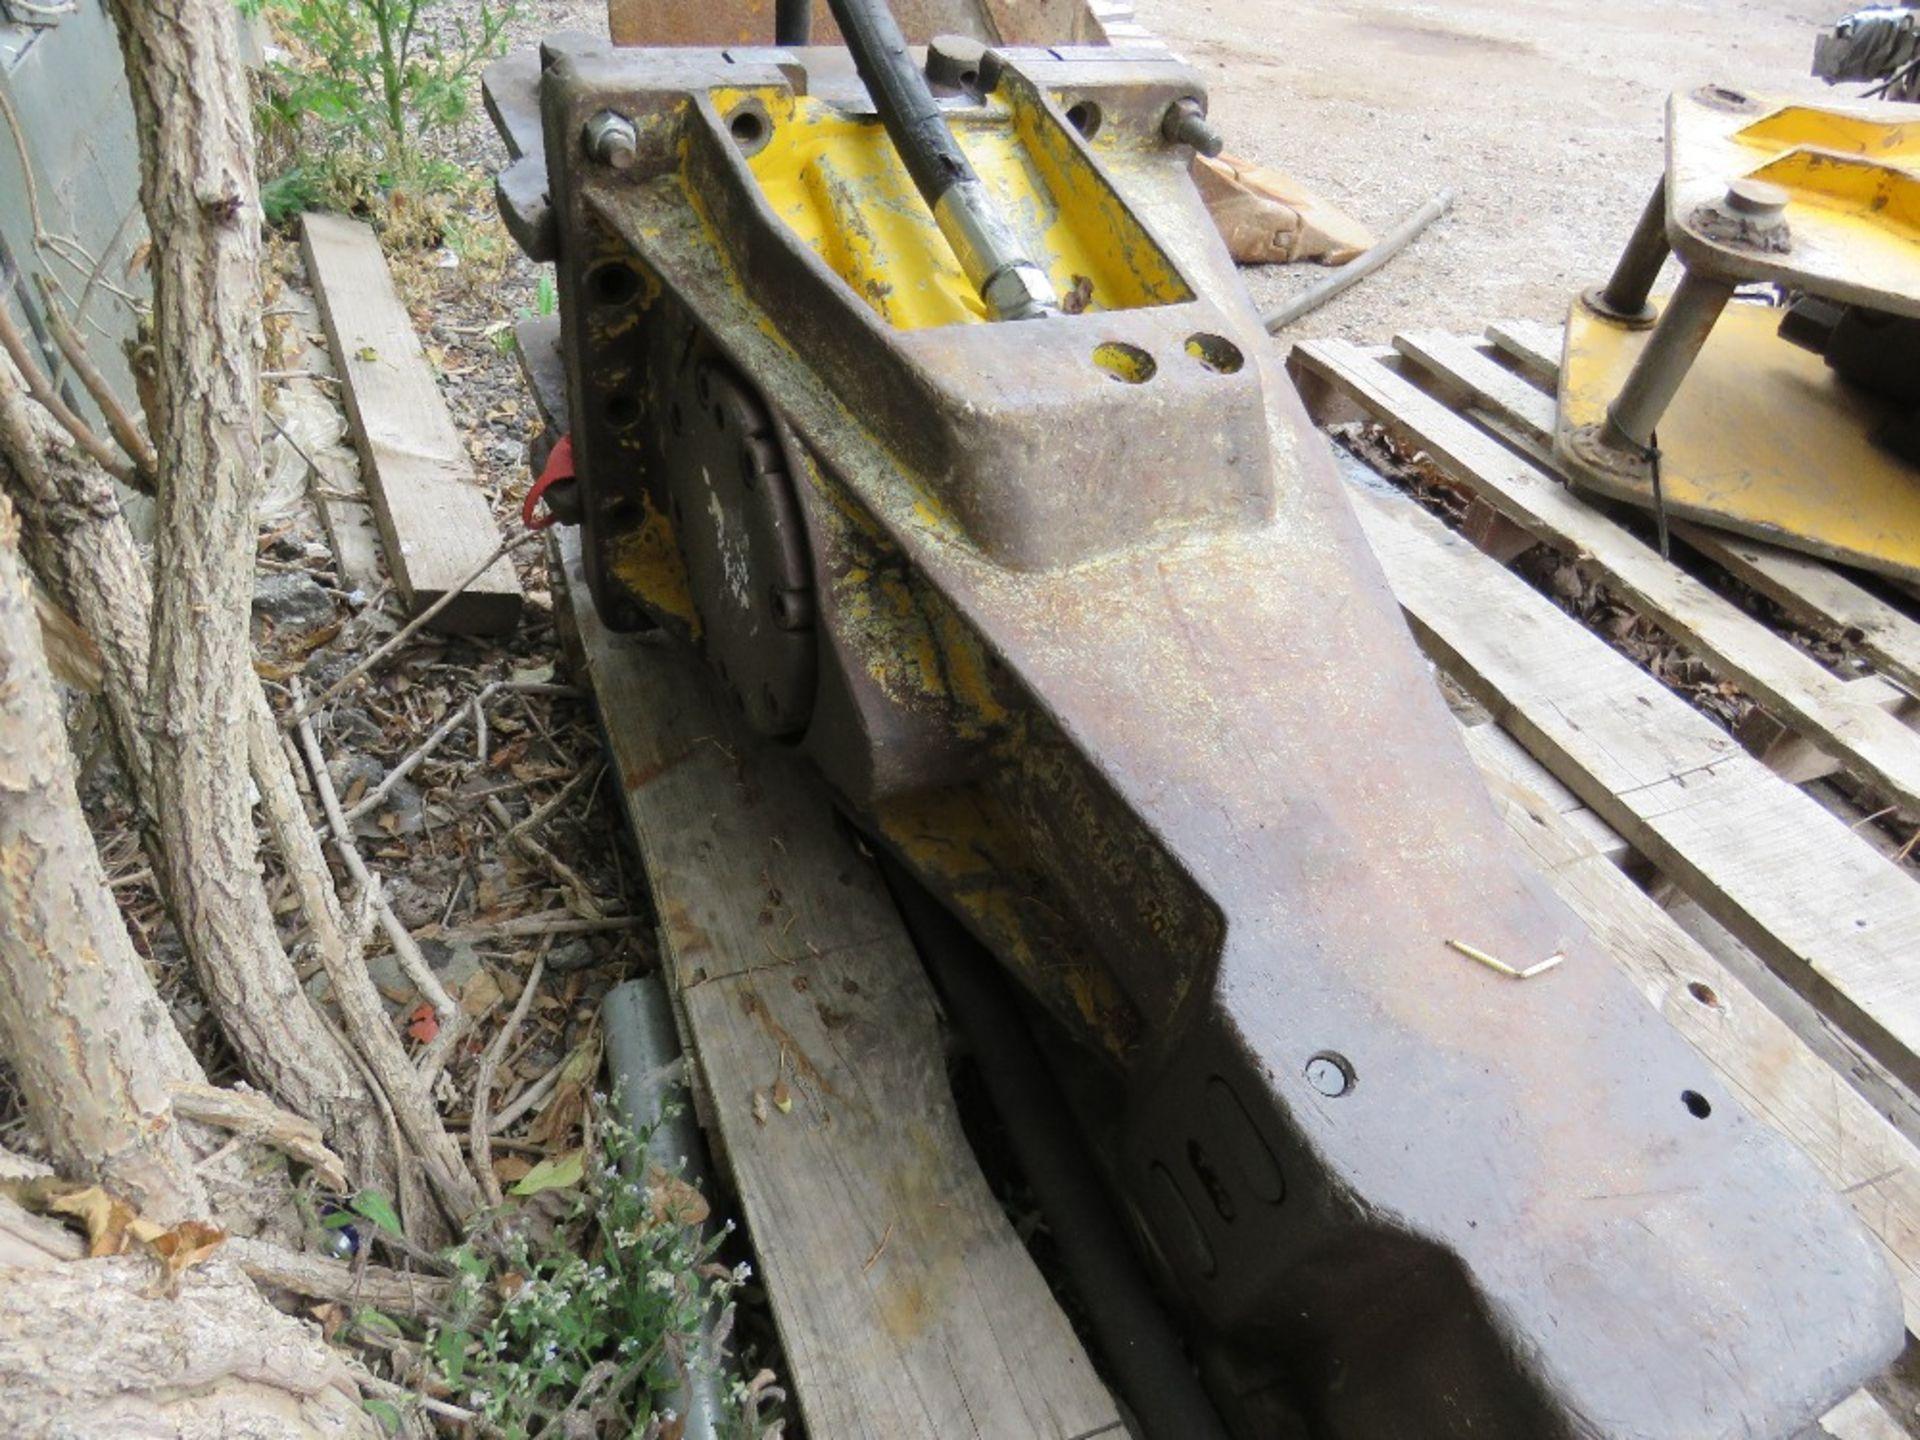 Lot 23 - ATLAS COPCO BREAKER TO SUIT AN 8 TONNE EXCAVATOR, ON 50MM PINS